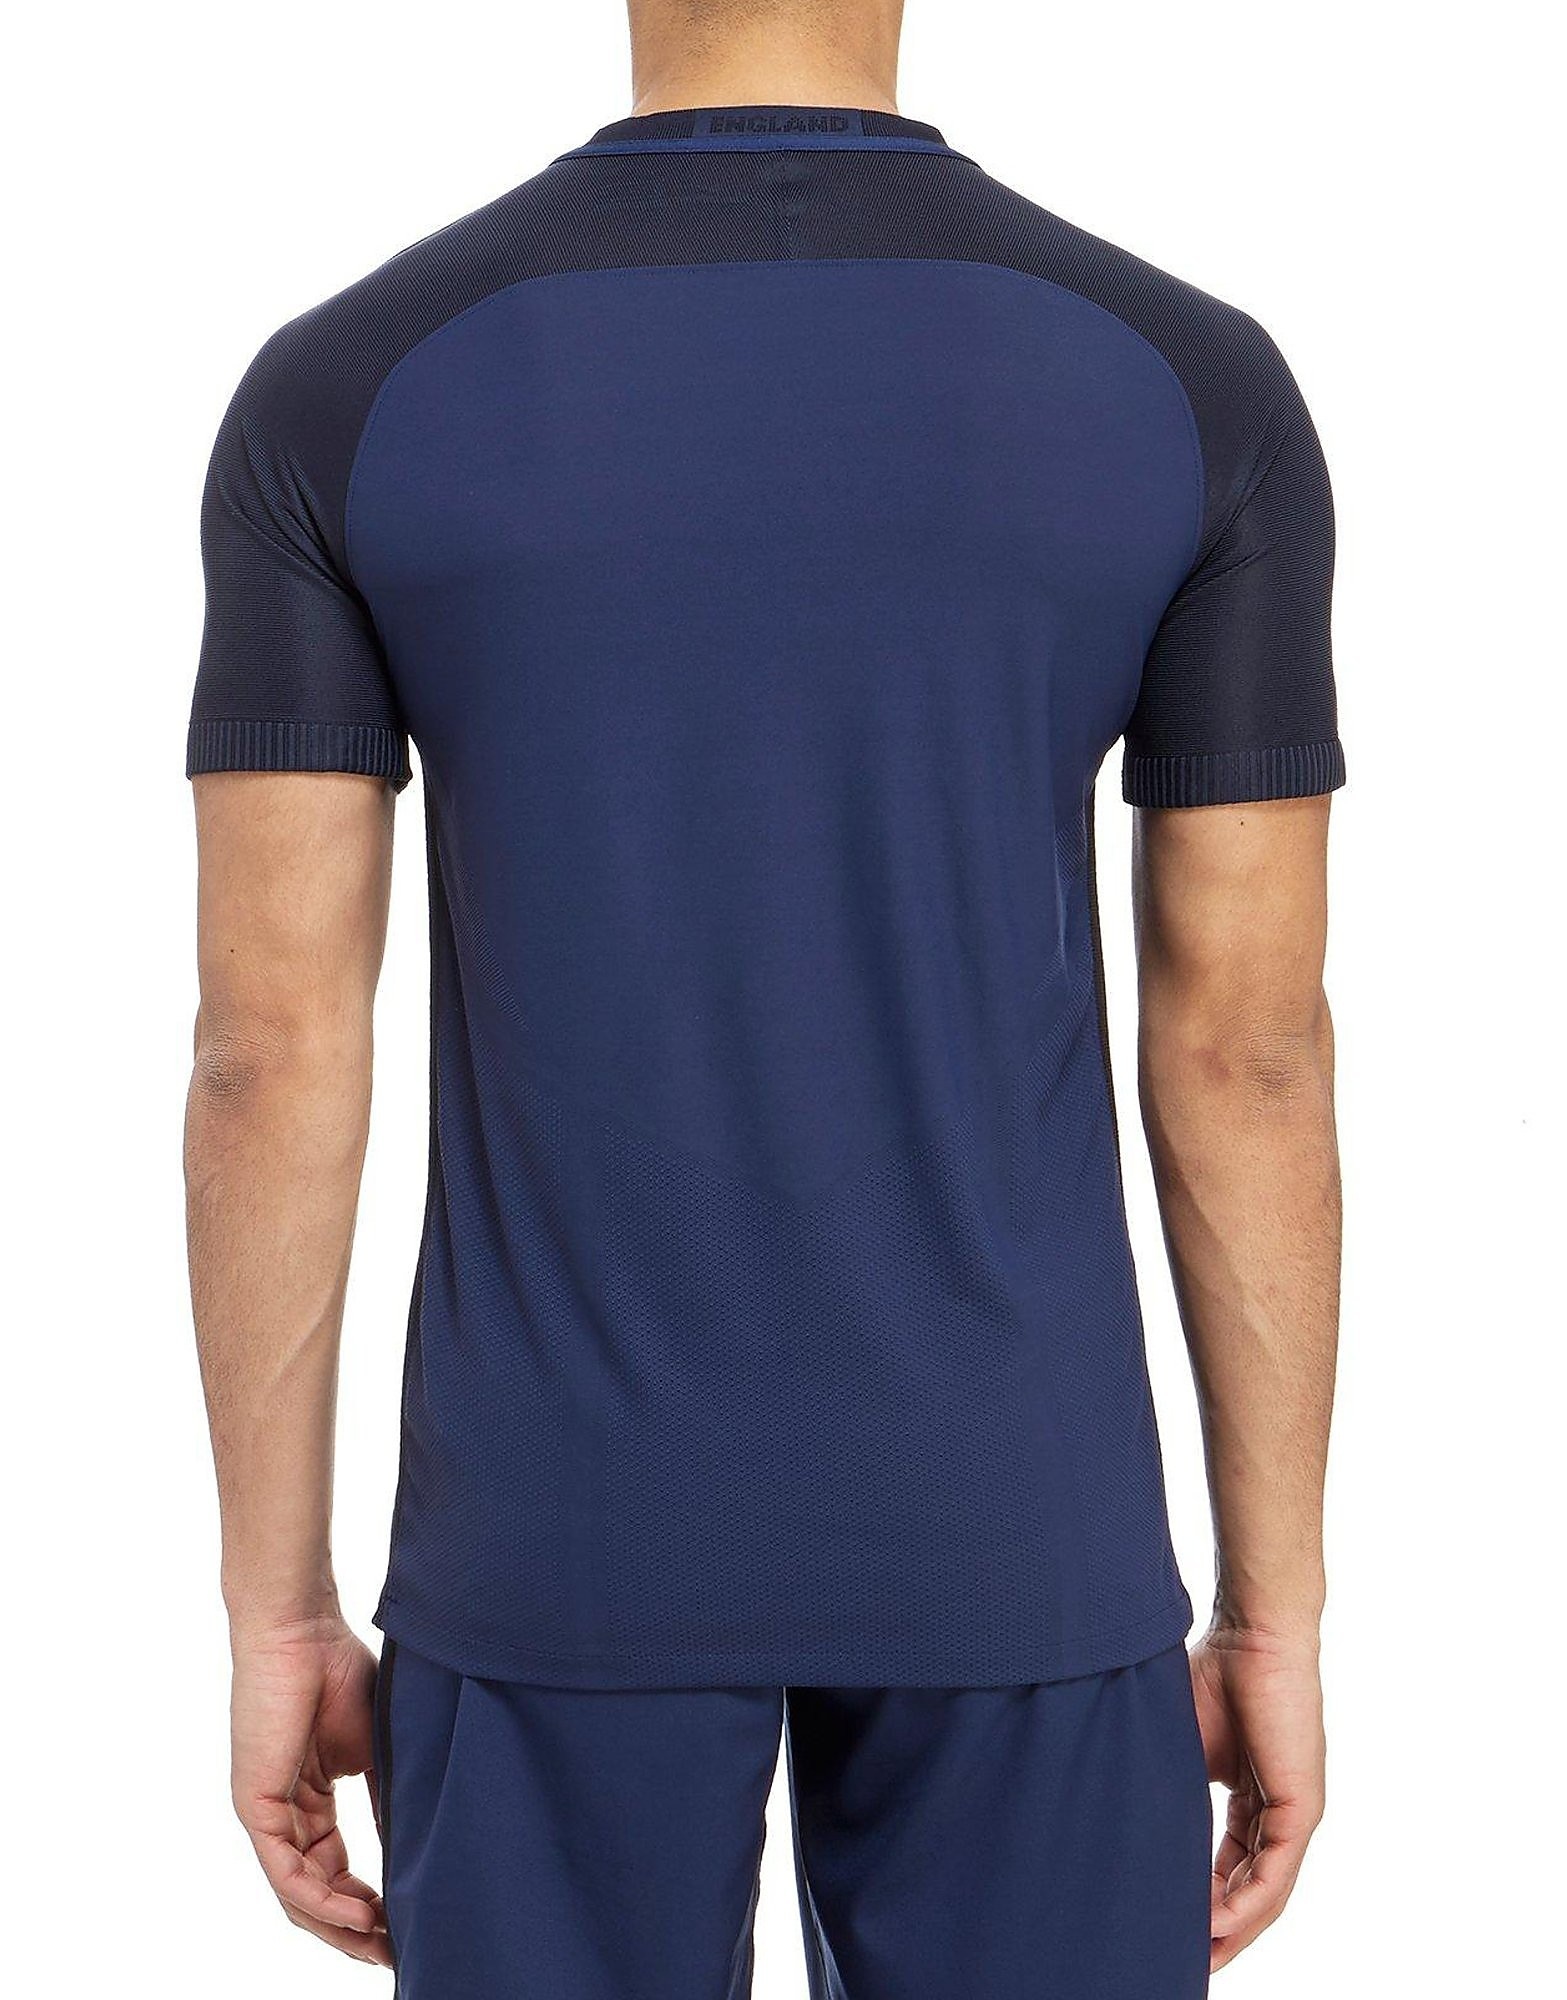 Nike England Away 2017 Match Shirt